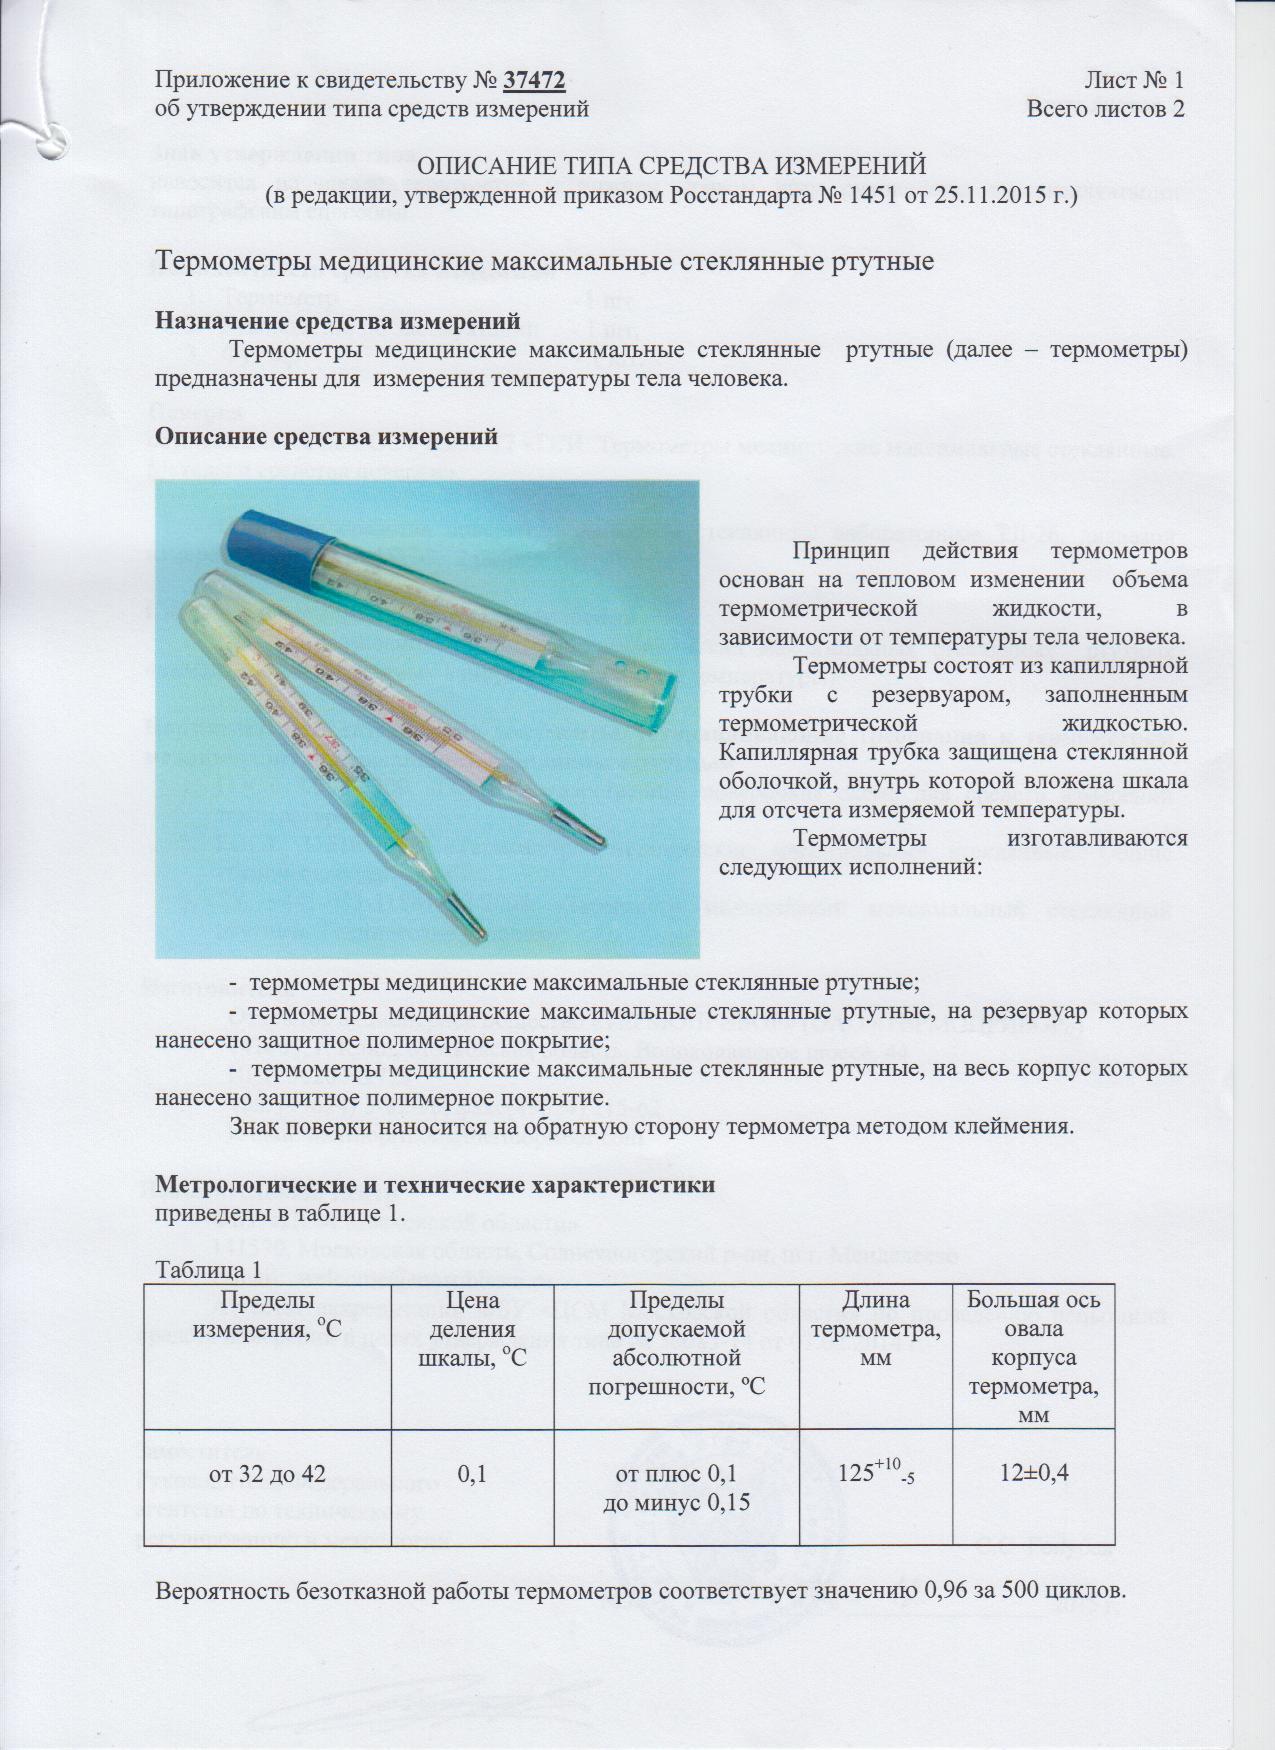 prilozh-1-svidetelstvo-utv-37472